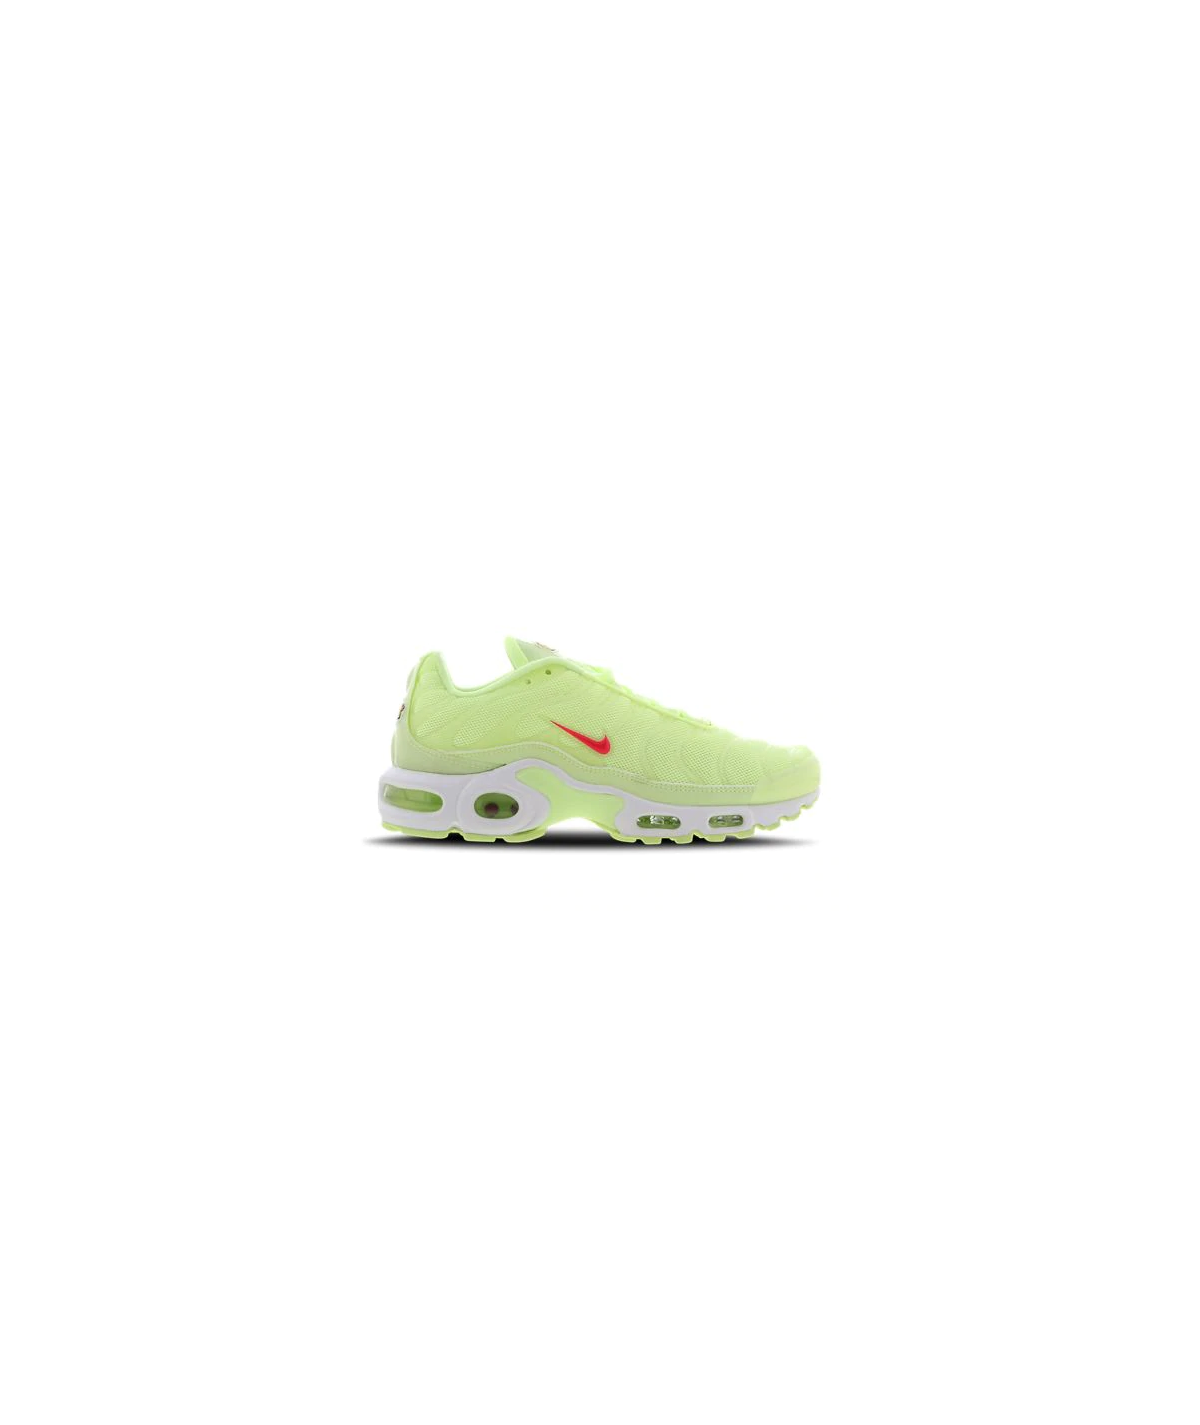 Nike Air Max Plus Martinique I Chaussure de sport Femme I Vert fluo - Blanc